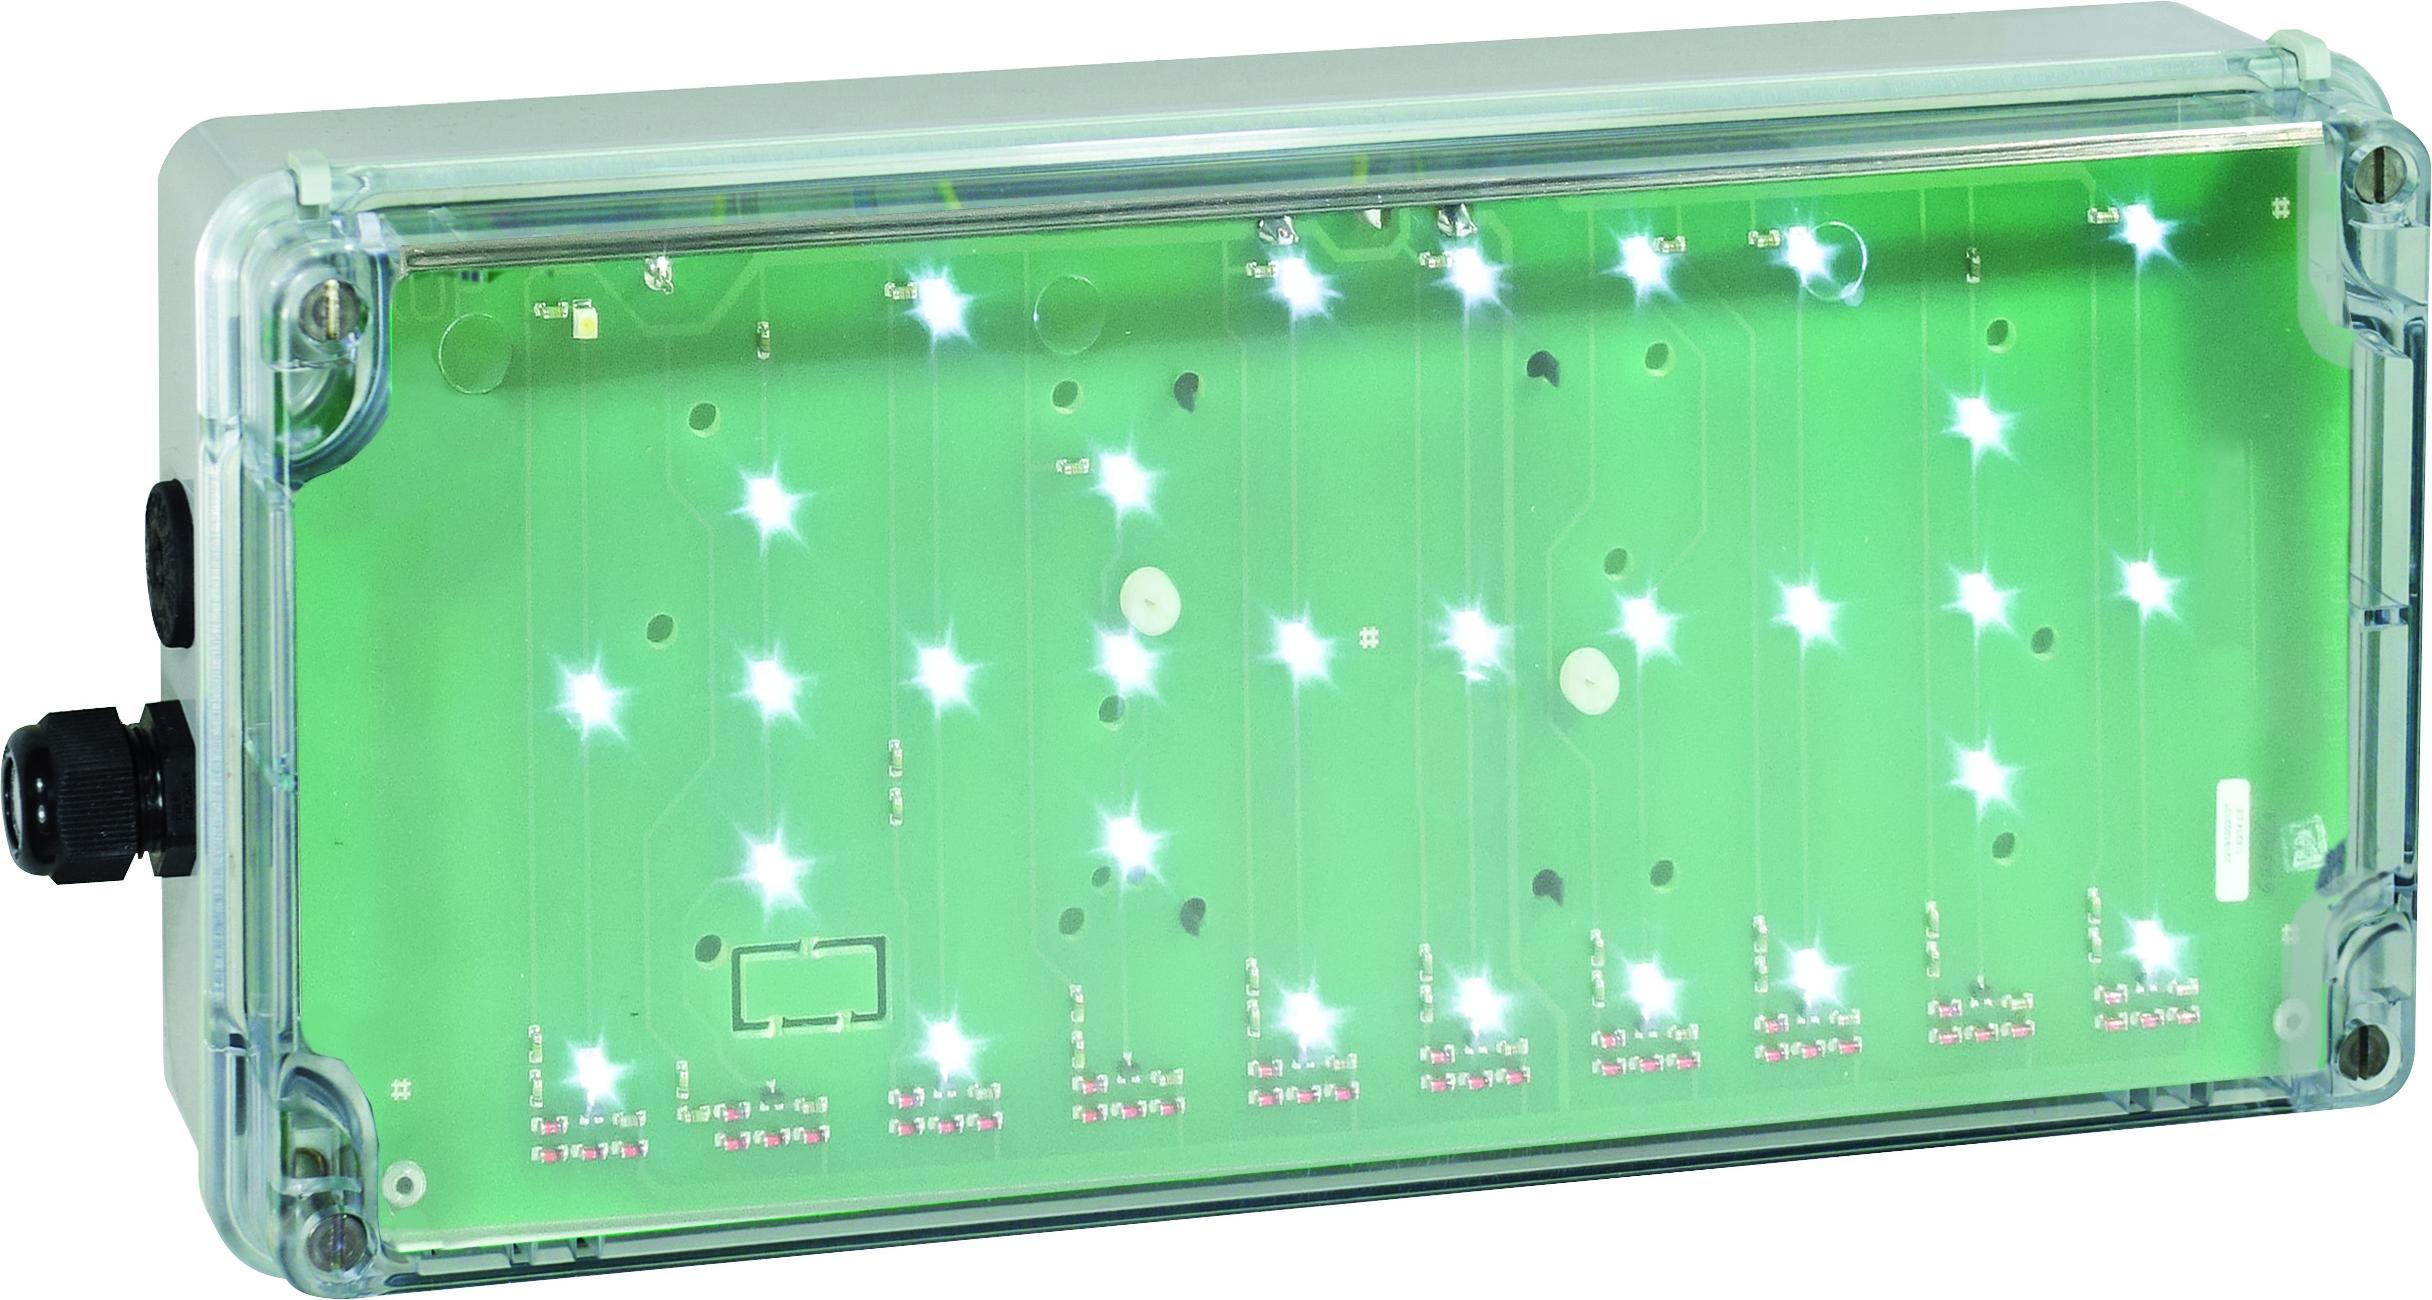 1 Stk Ex-Notleuchte EXIT Zone 1/21 LED/ 3h 230V AC, transparent NL91030004